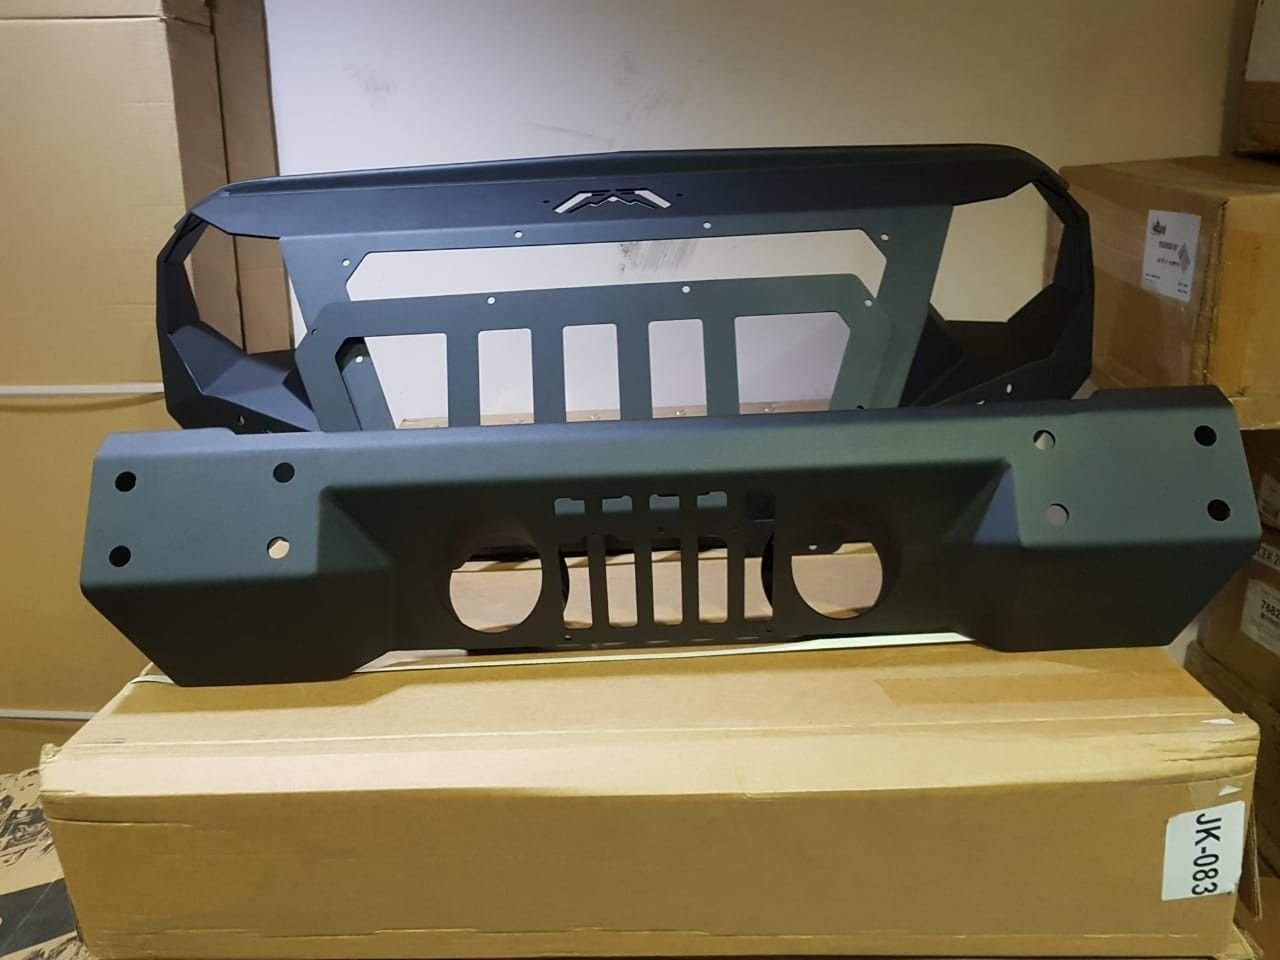 Pionirjeep Jual Aksesoris Jeep Jk Wrangler Replika Fabfours Grumper 1 64 Truck Bumper Jeepjk Jeepindonesia